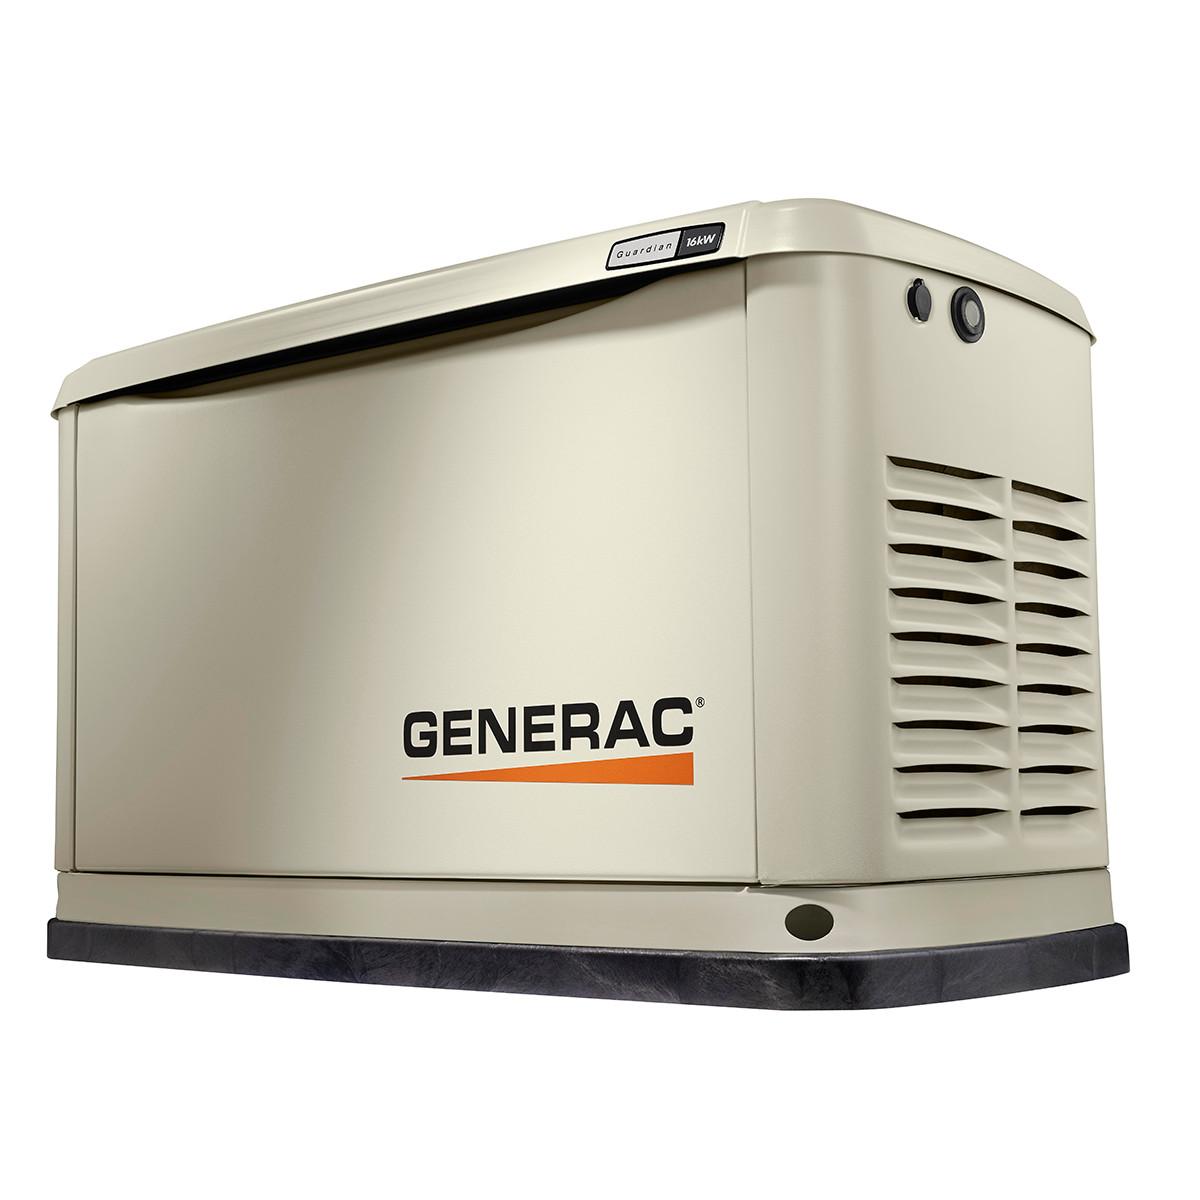 generac guardian 7035 16kw generator with wi fi [ 1200 x 1200 Pixel ]